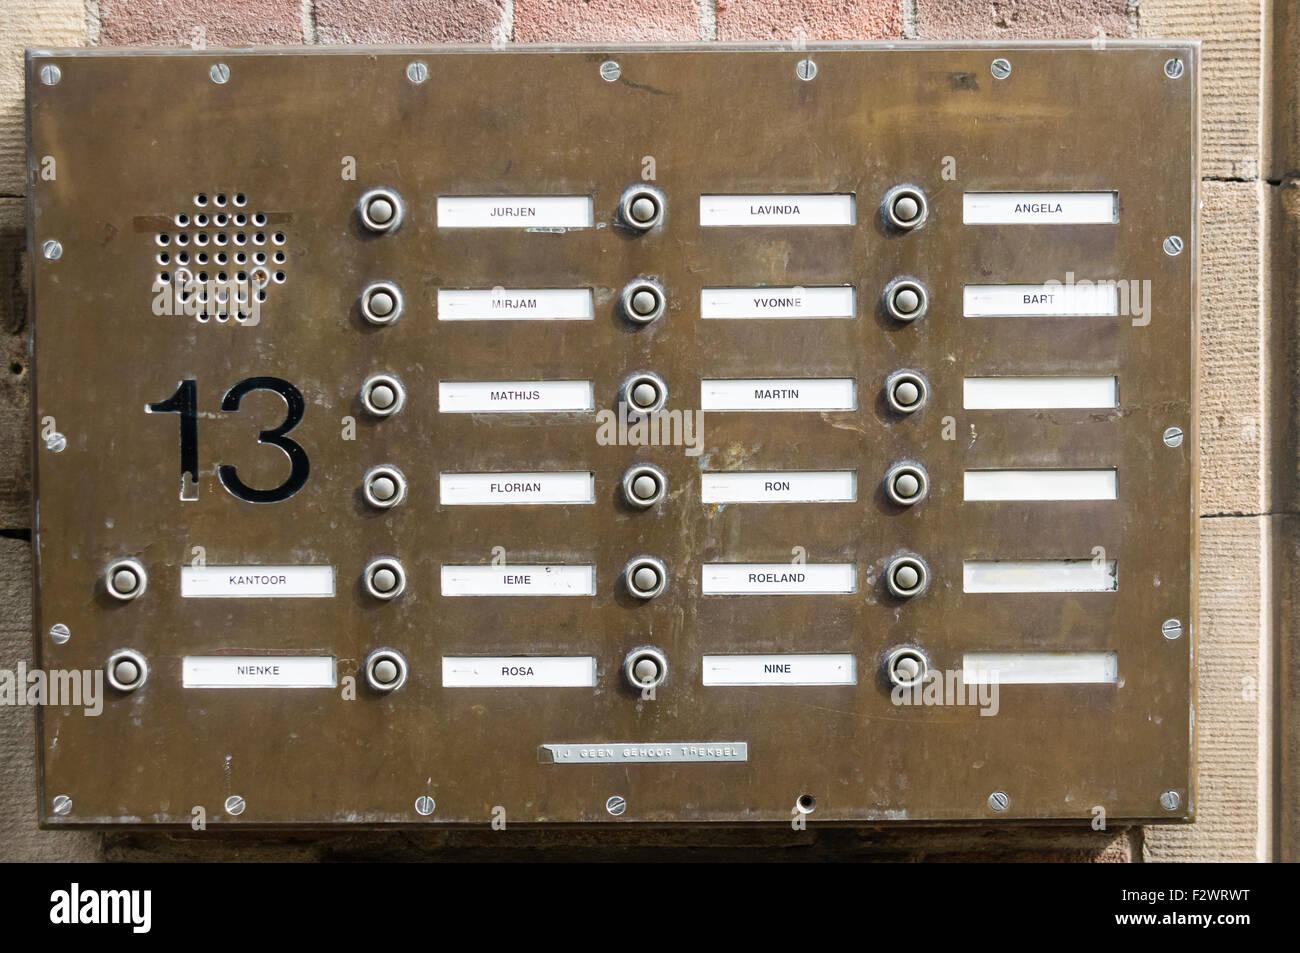 https://c8.alamy.com/comp/F2WRWT/door-bells-buttons-and-speaker-intercom-system-at-a-dutch-apartment-F2WRWT.jpg